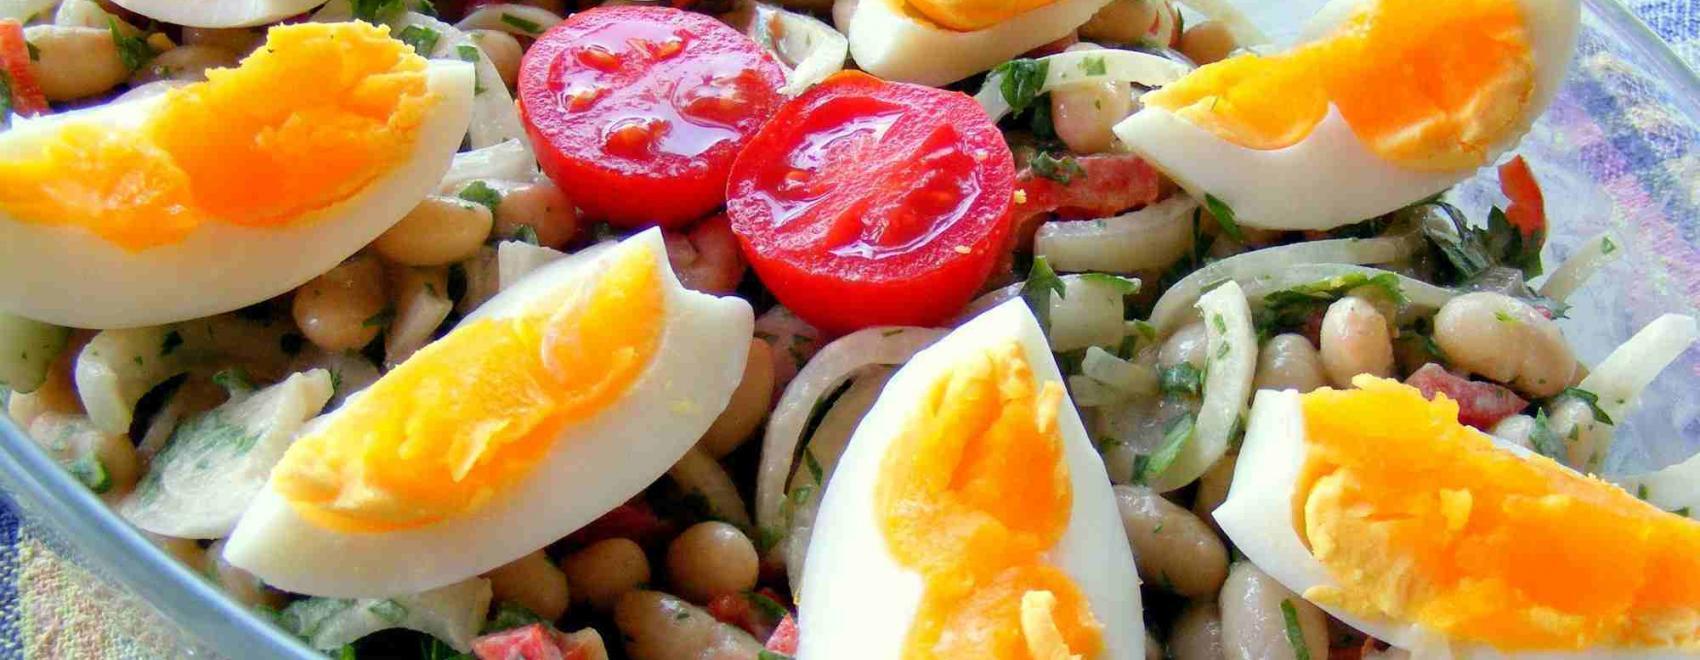 Antalya-Style Piyaz, White Bean Salad Recipe